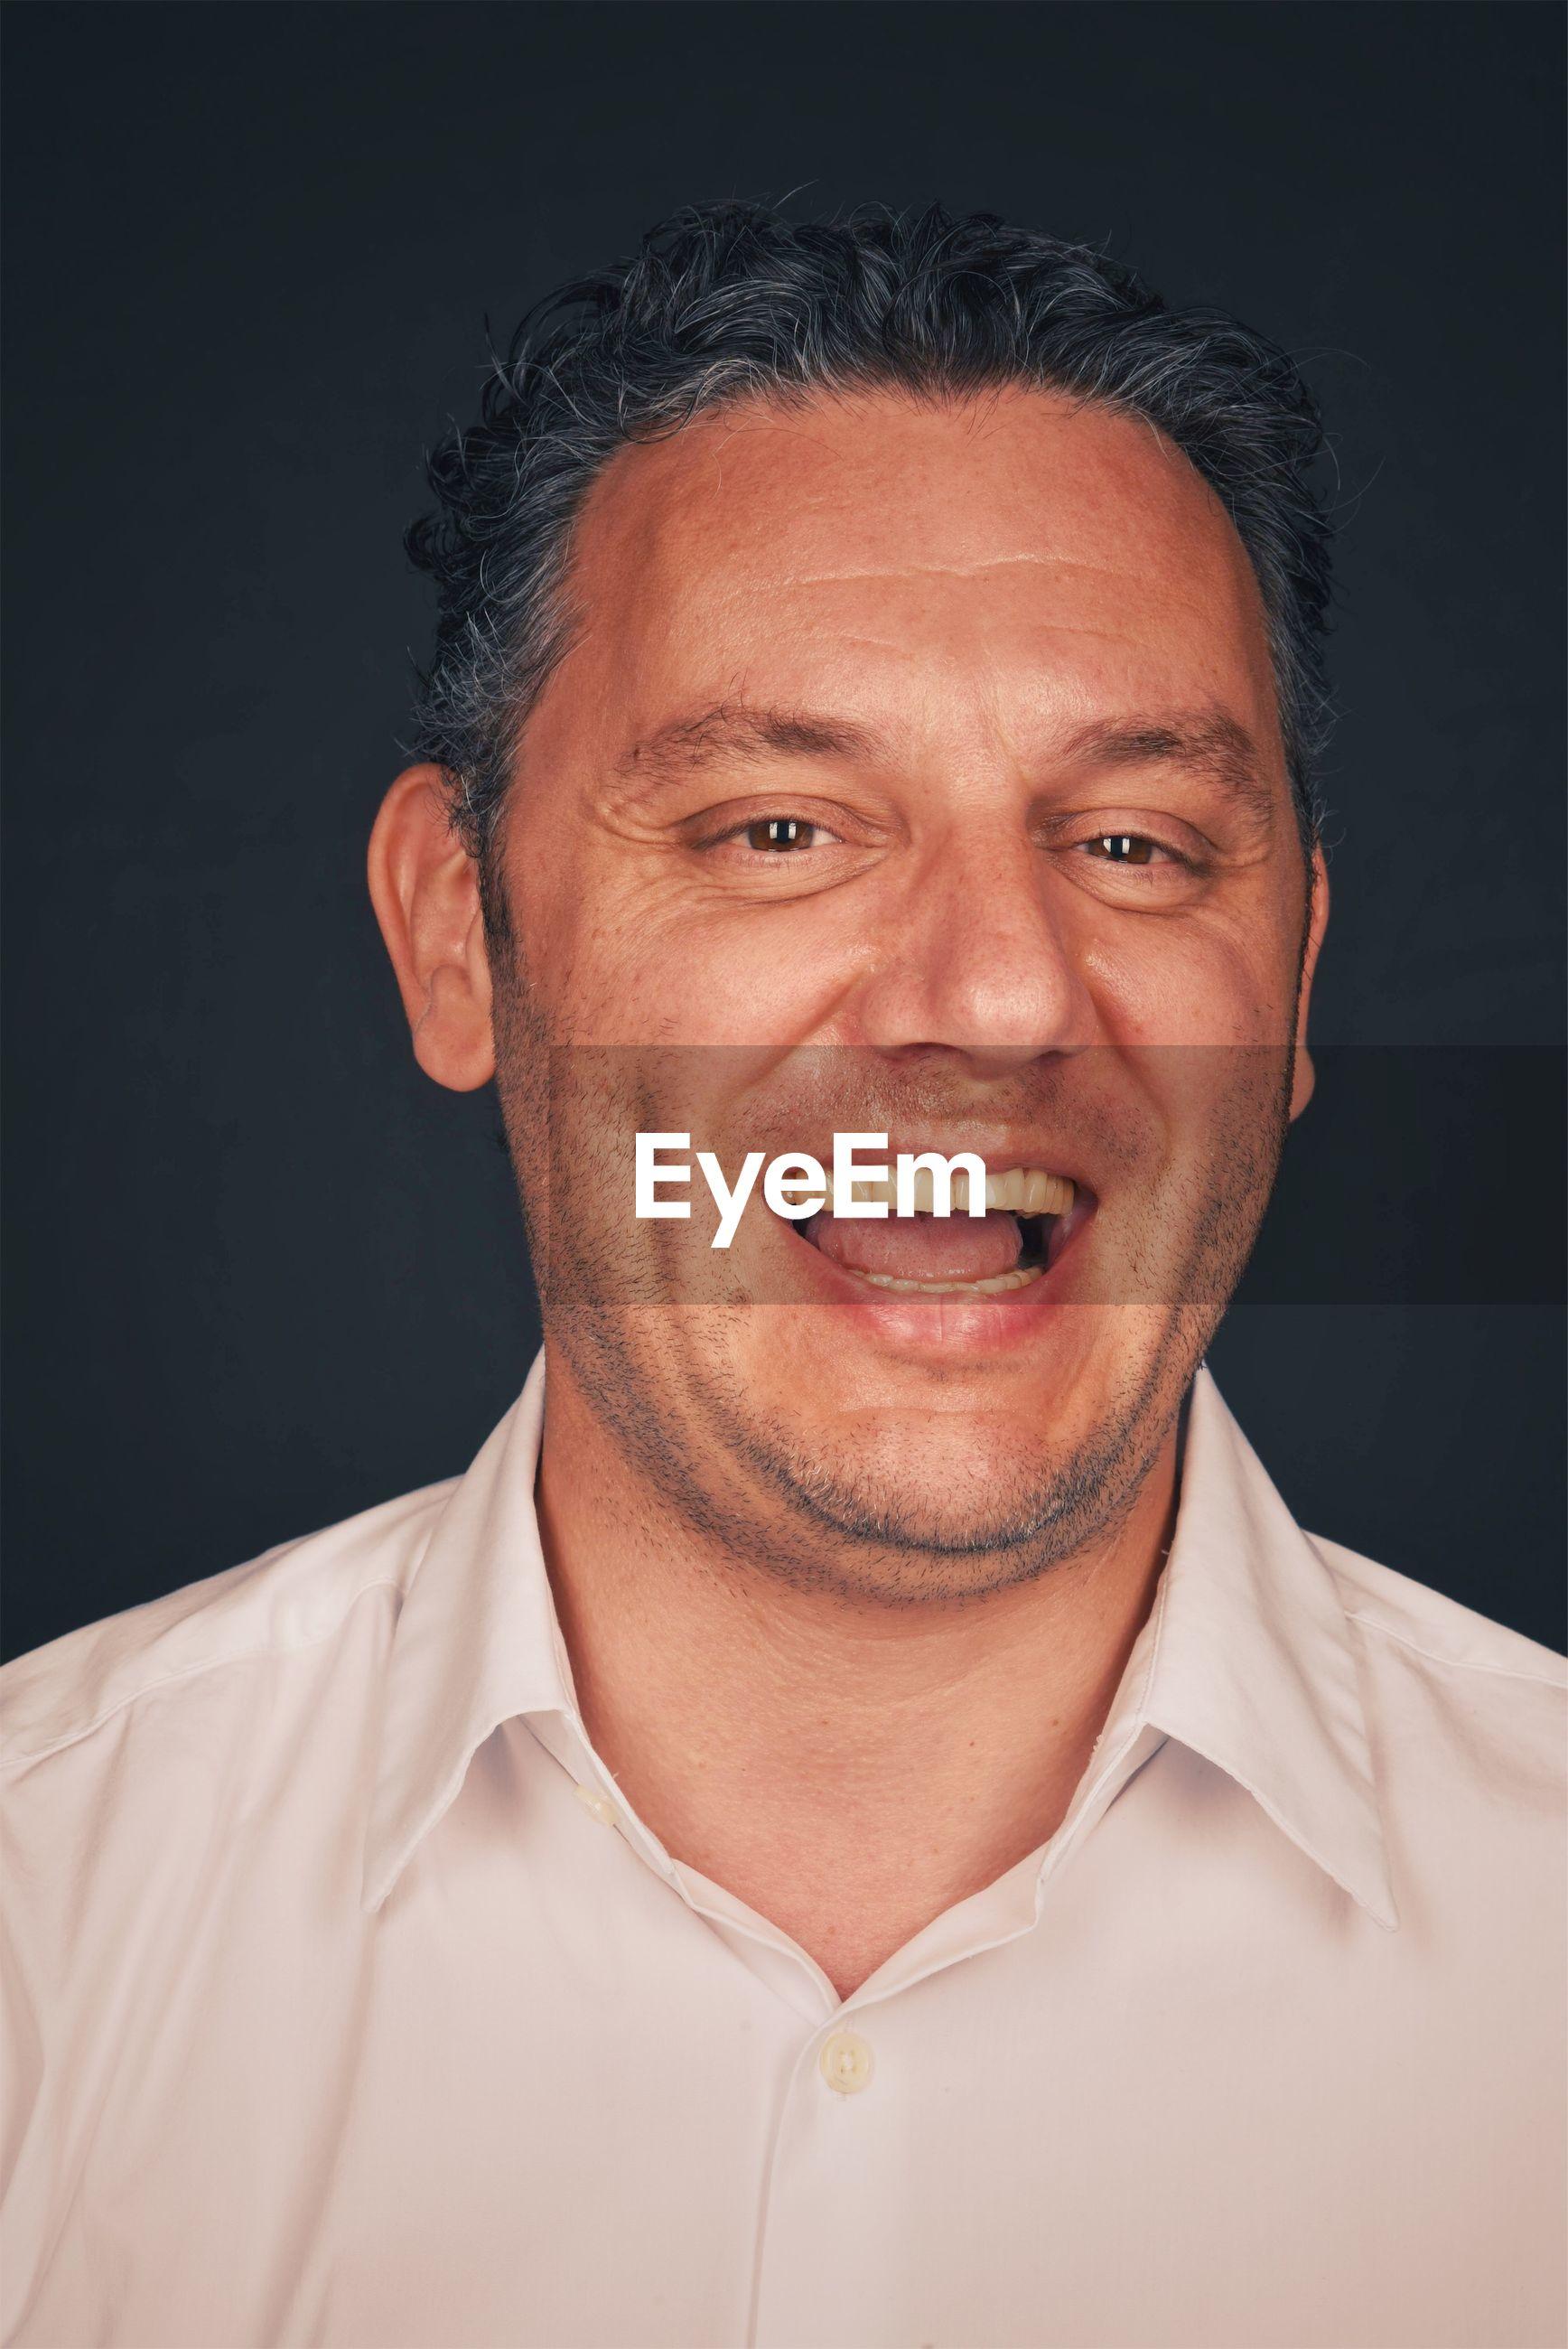 CLOSE-UP PORTRAIT OF A SMILING MAN